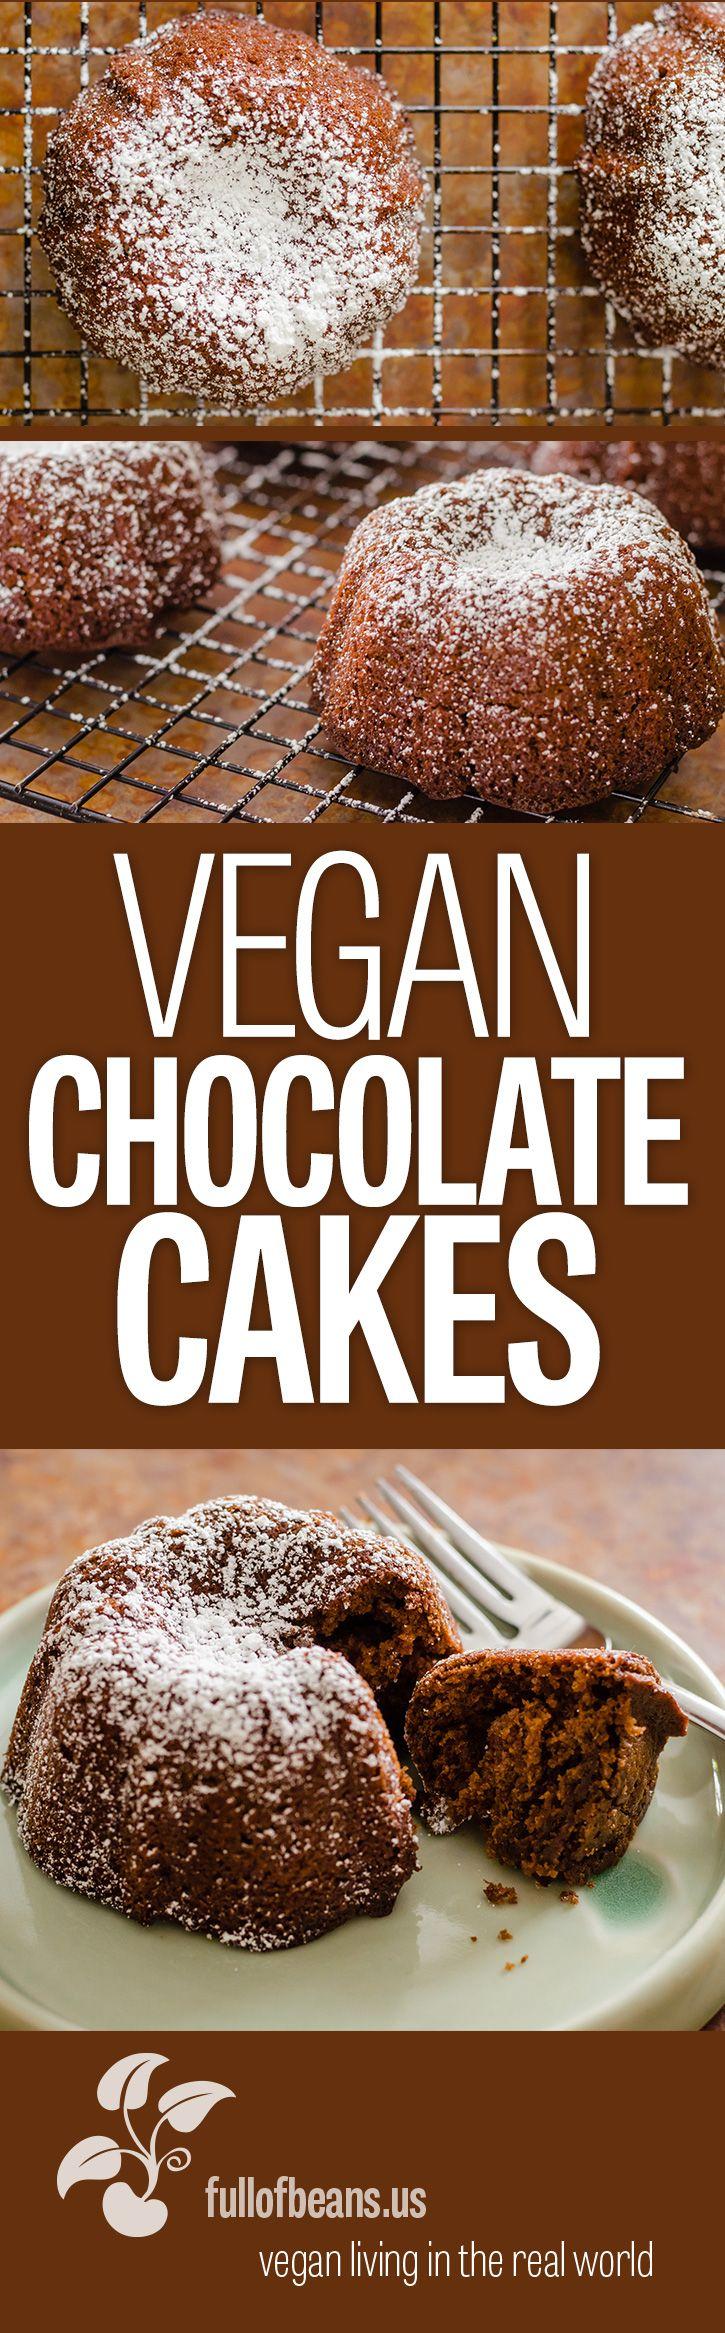 25 Best Ideas About Vegan Chocolate Cakes On Pinterest